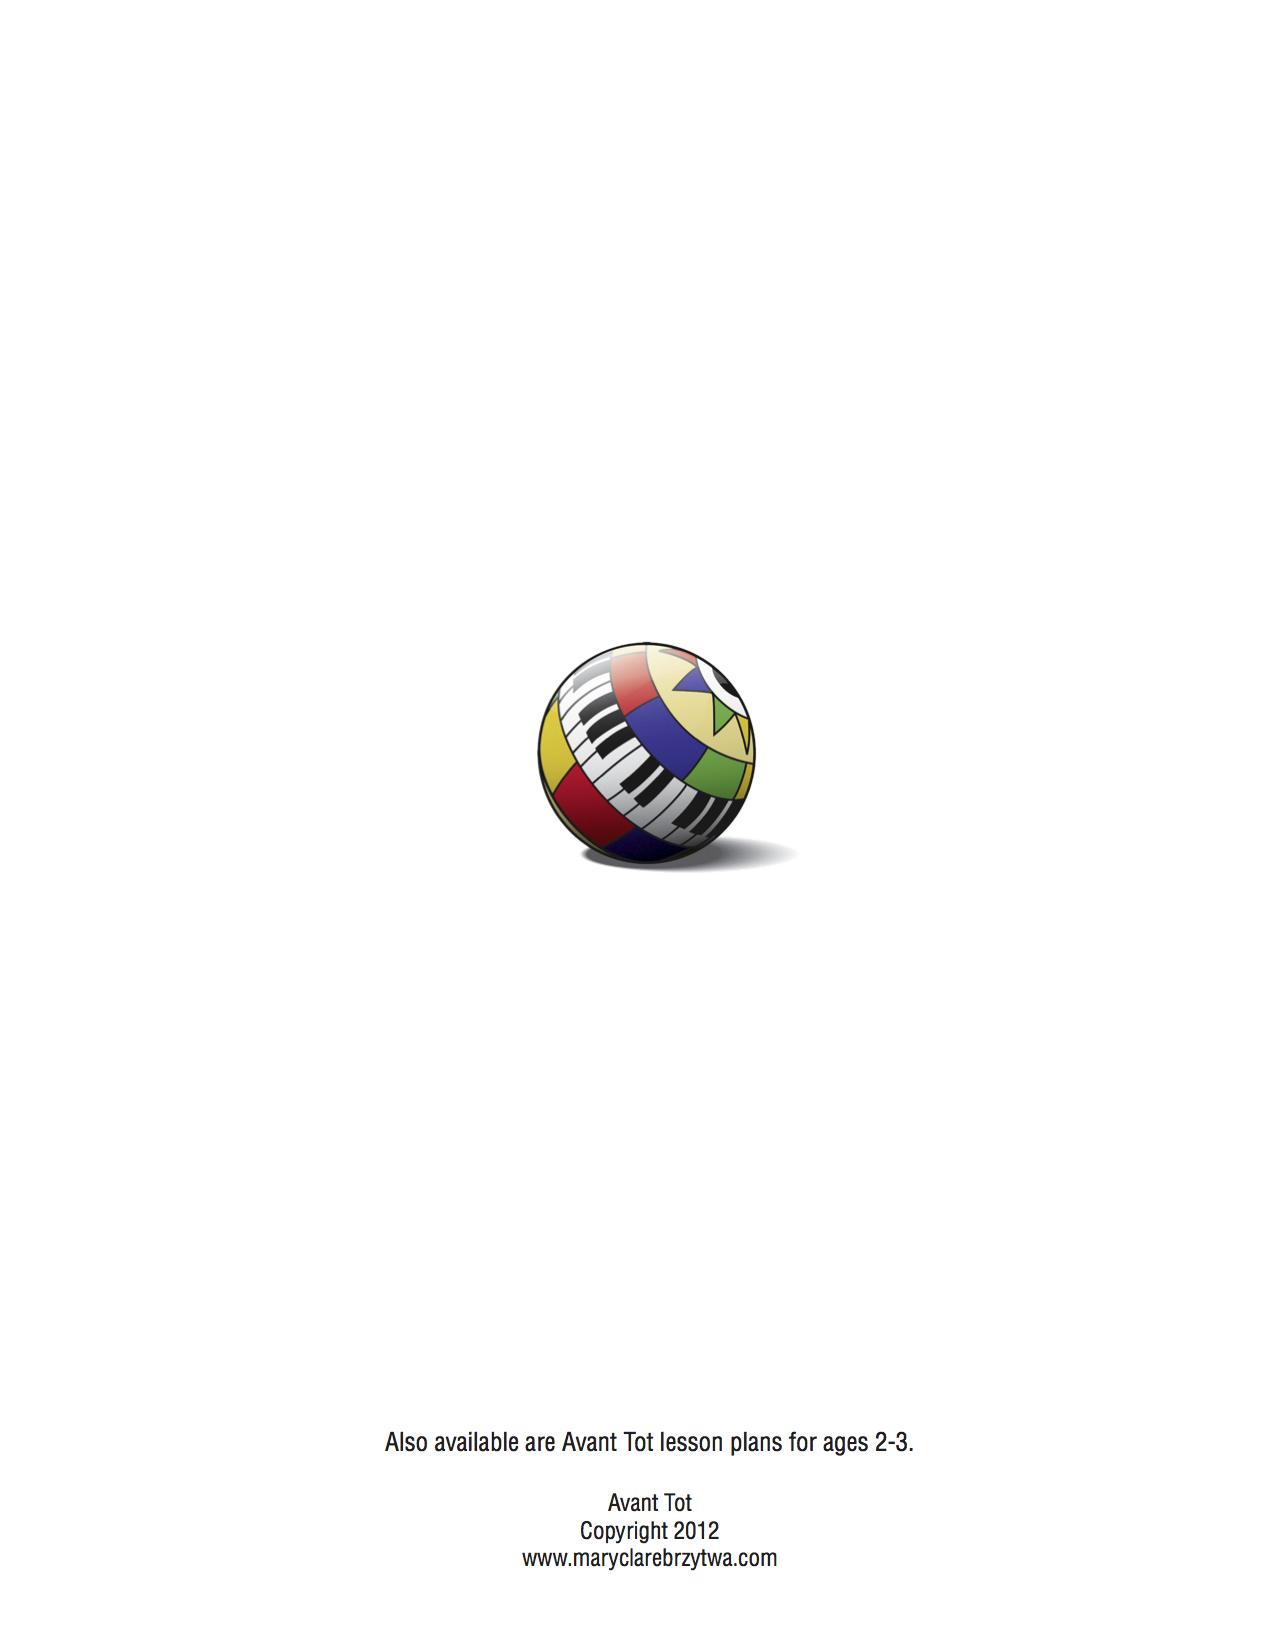 avanttot-print (2) (dragged) 1.jpeg